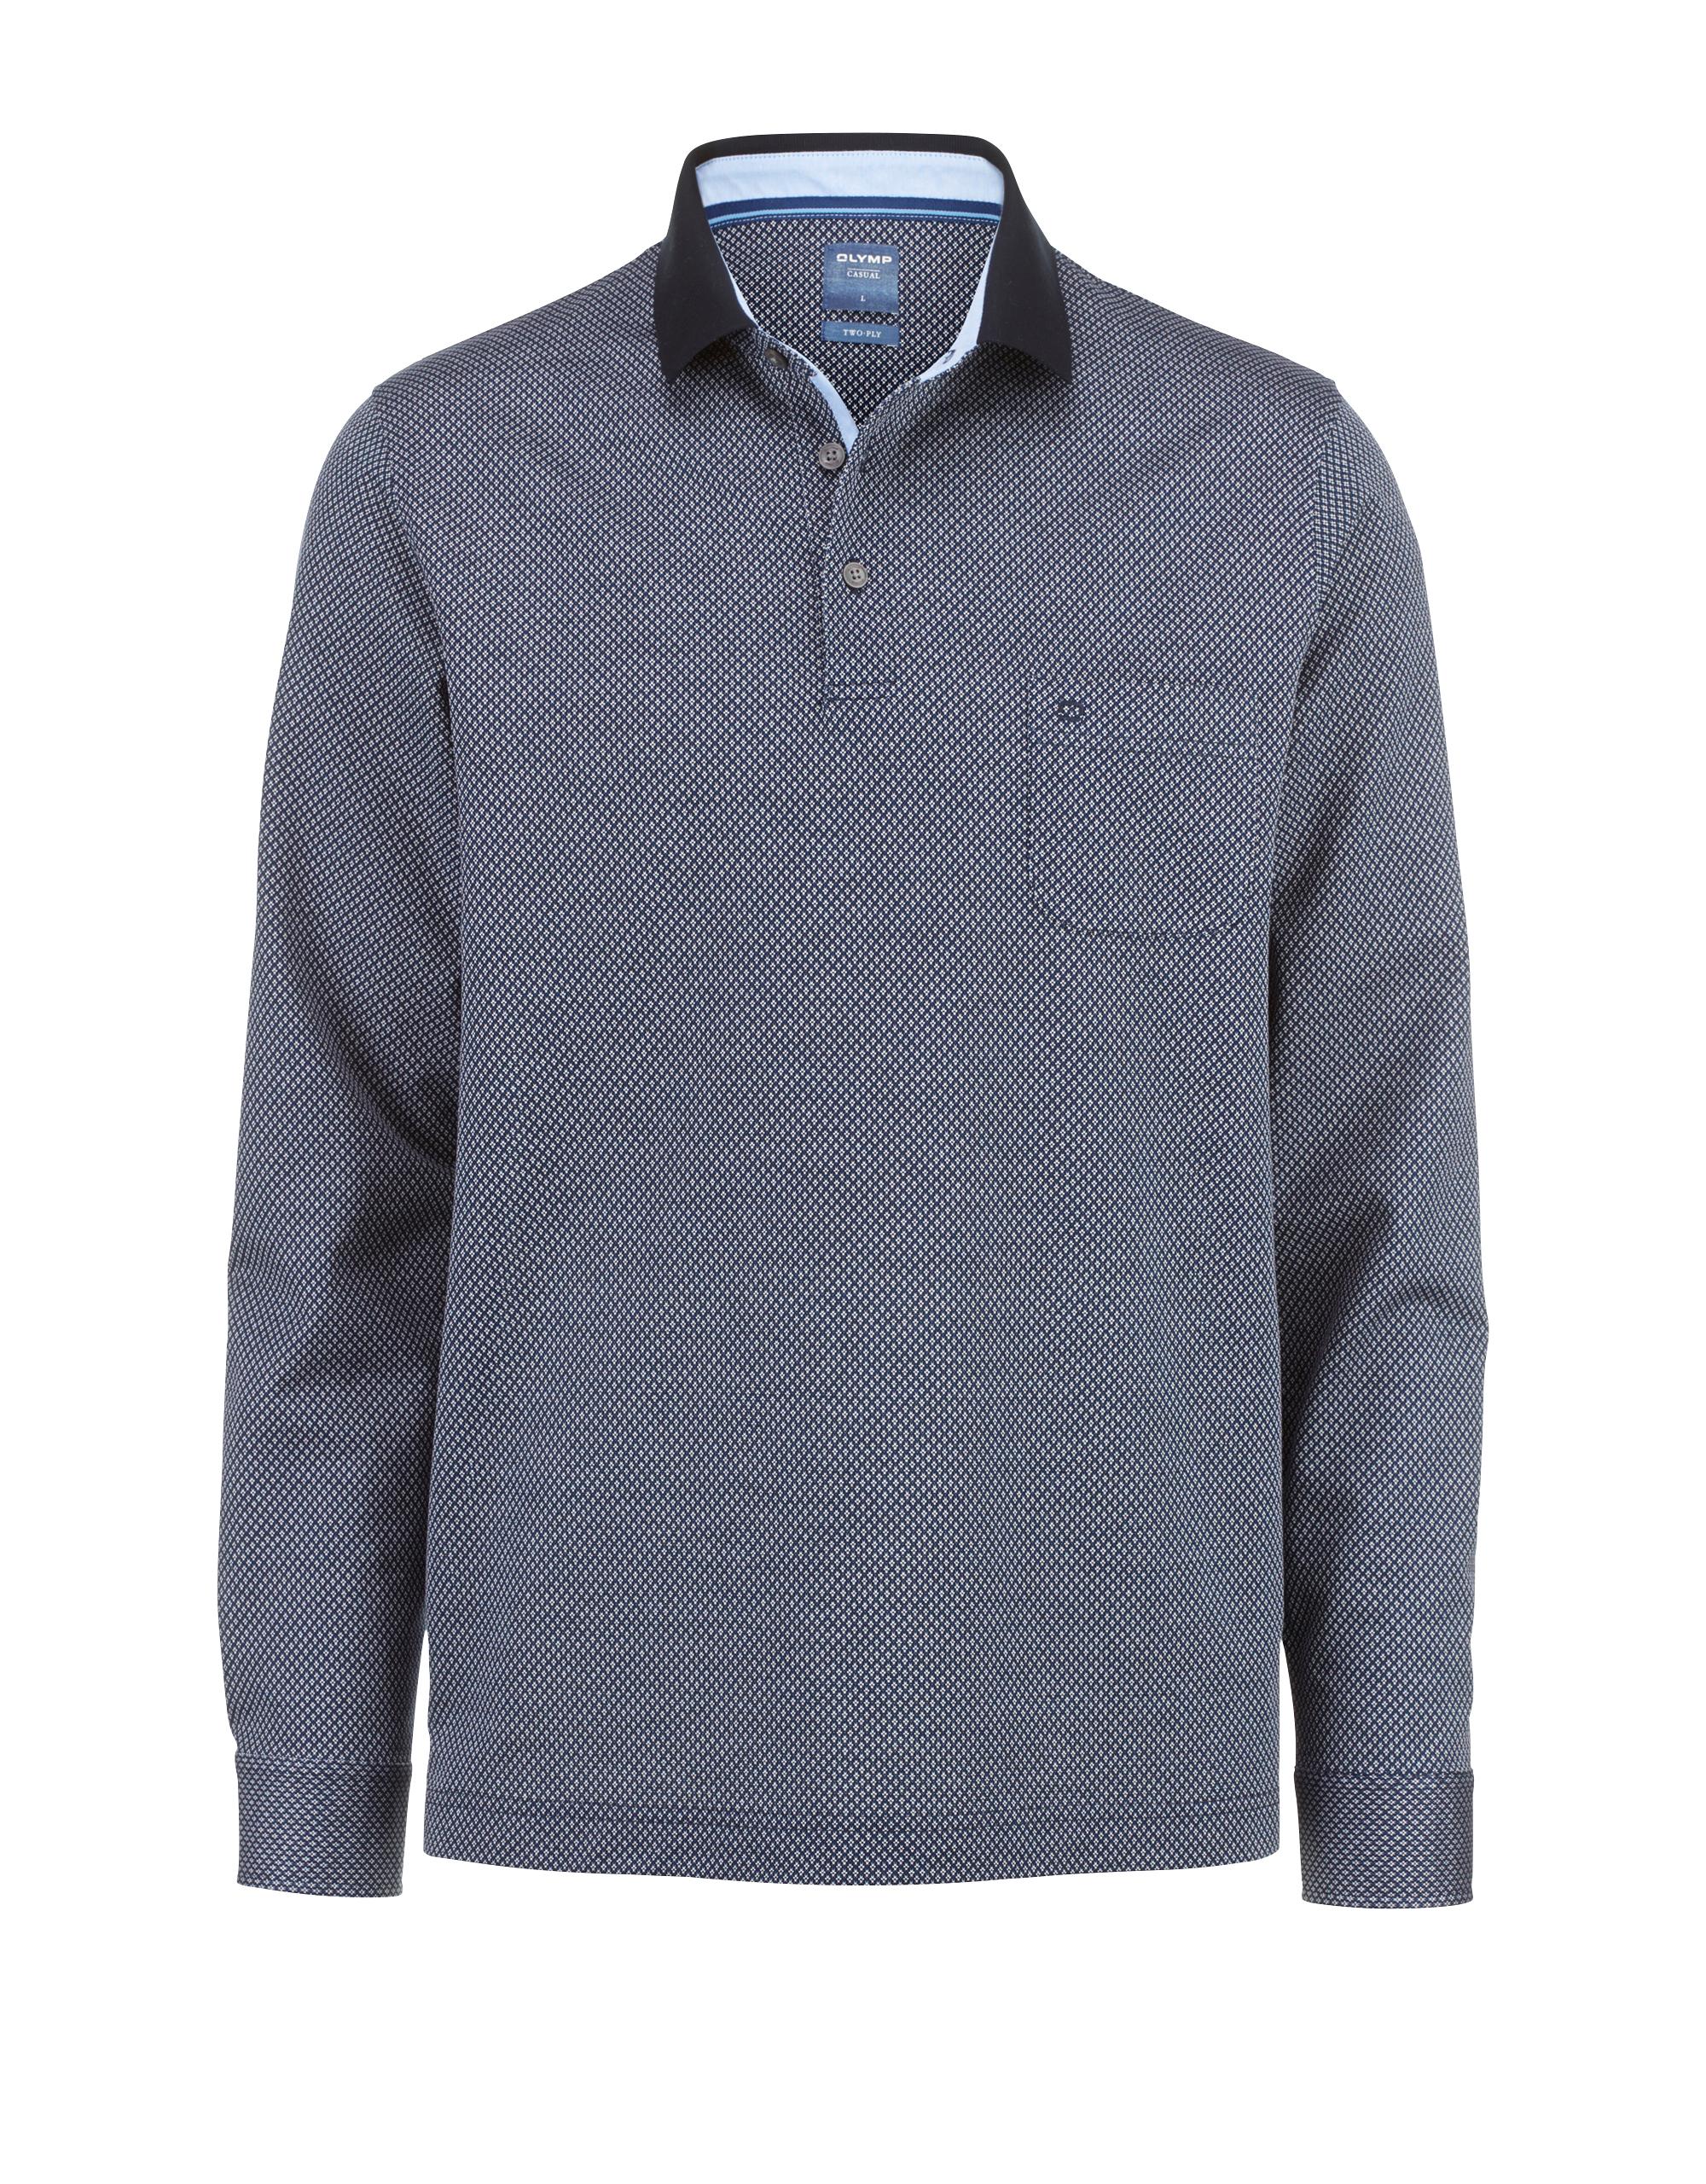 OLYMP Casual Polo-shirt, modern fit, Nürnberger Blau, XXL | Bekleidung > Polo Shirts > Kurzarm | Blau | Baumwolle | OLYMP